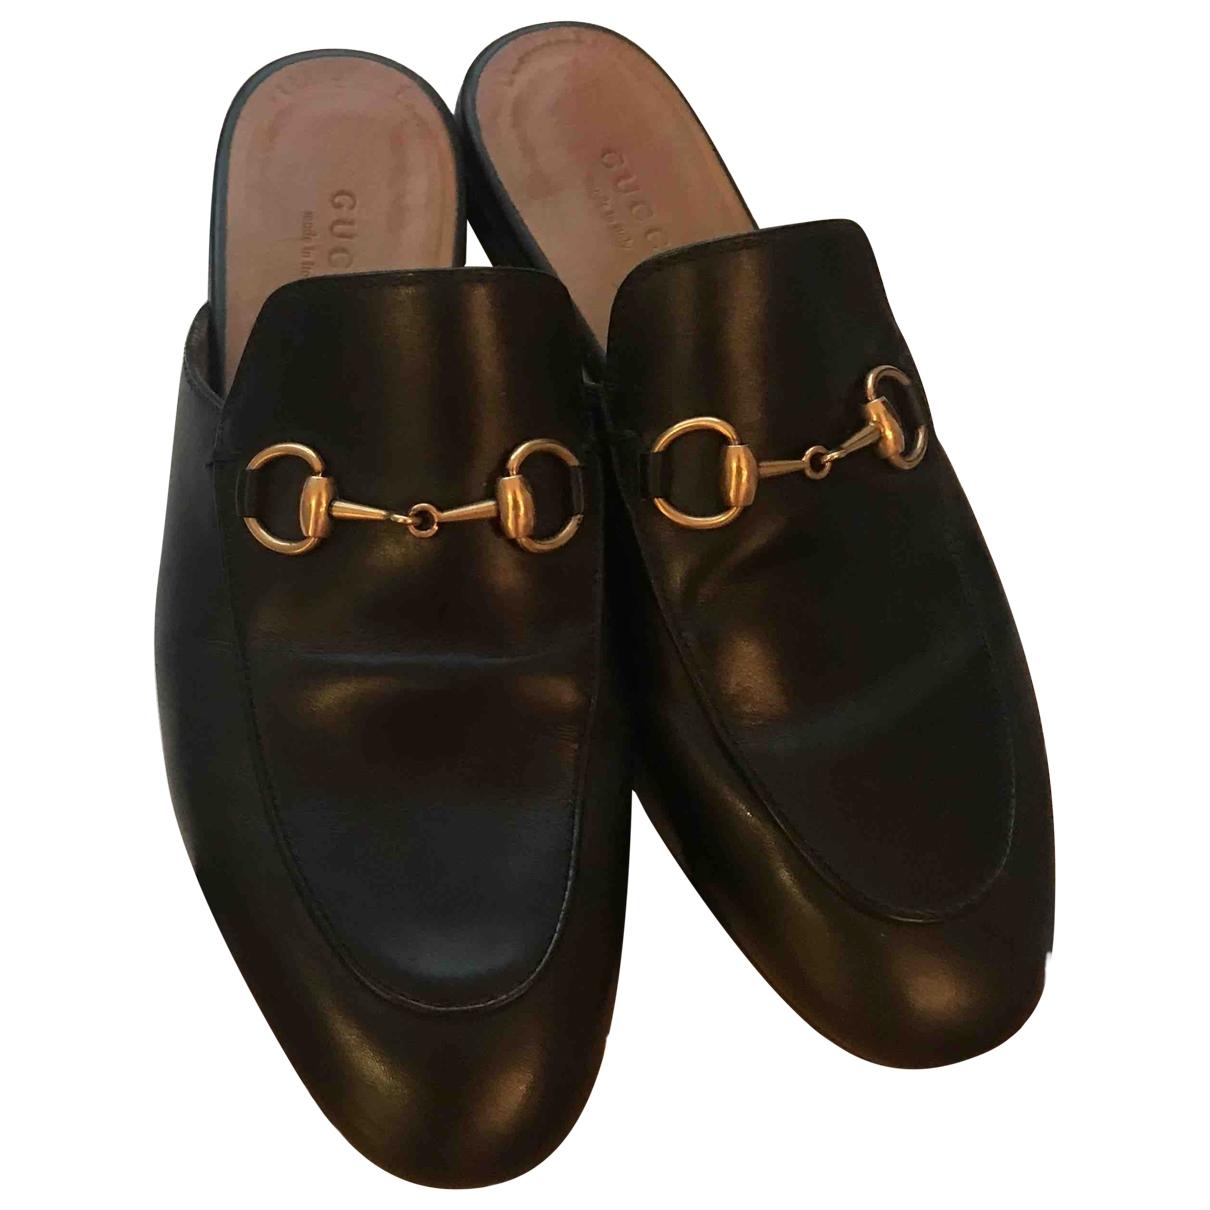 Gucci Princetown Black Leather Flats for Women 35 EU